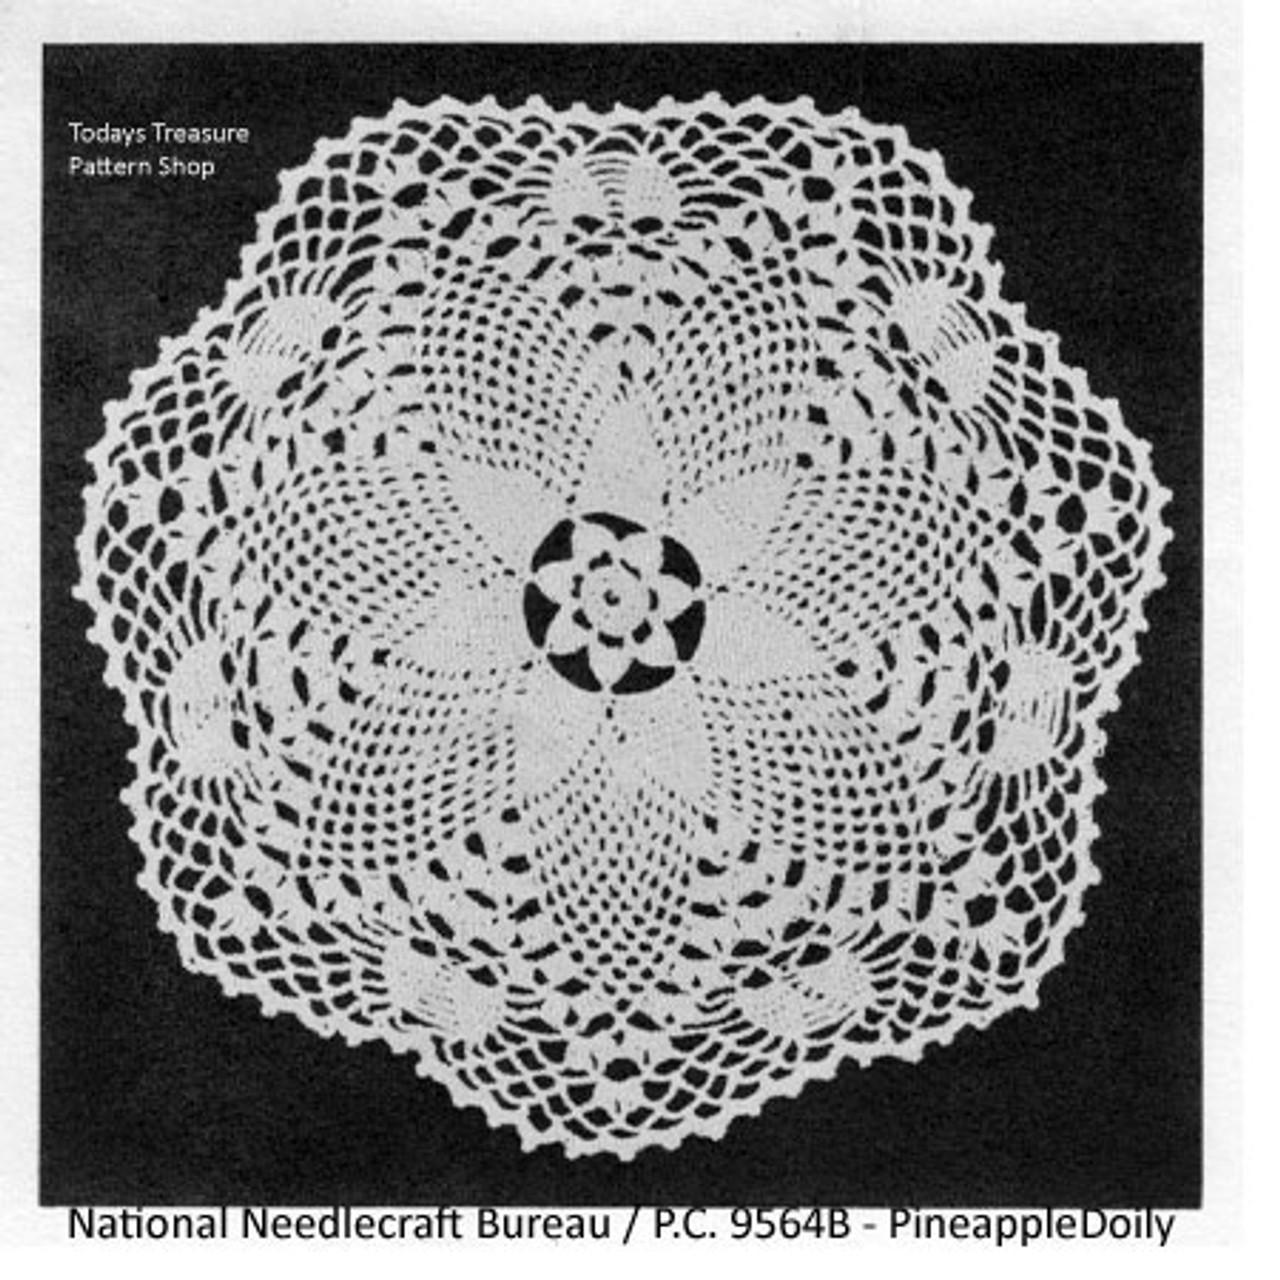 Pineapple Crochet Doily Pattern Leaflet from National Needlecraft